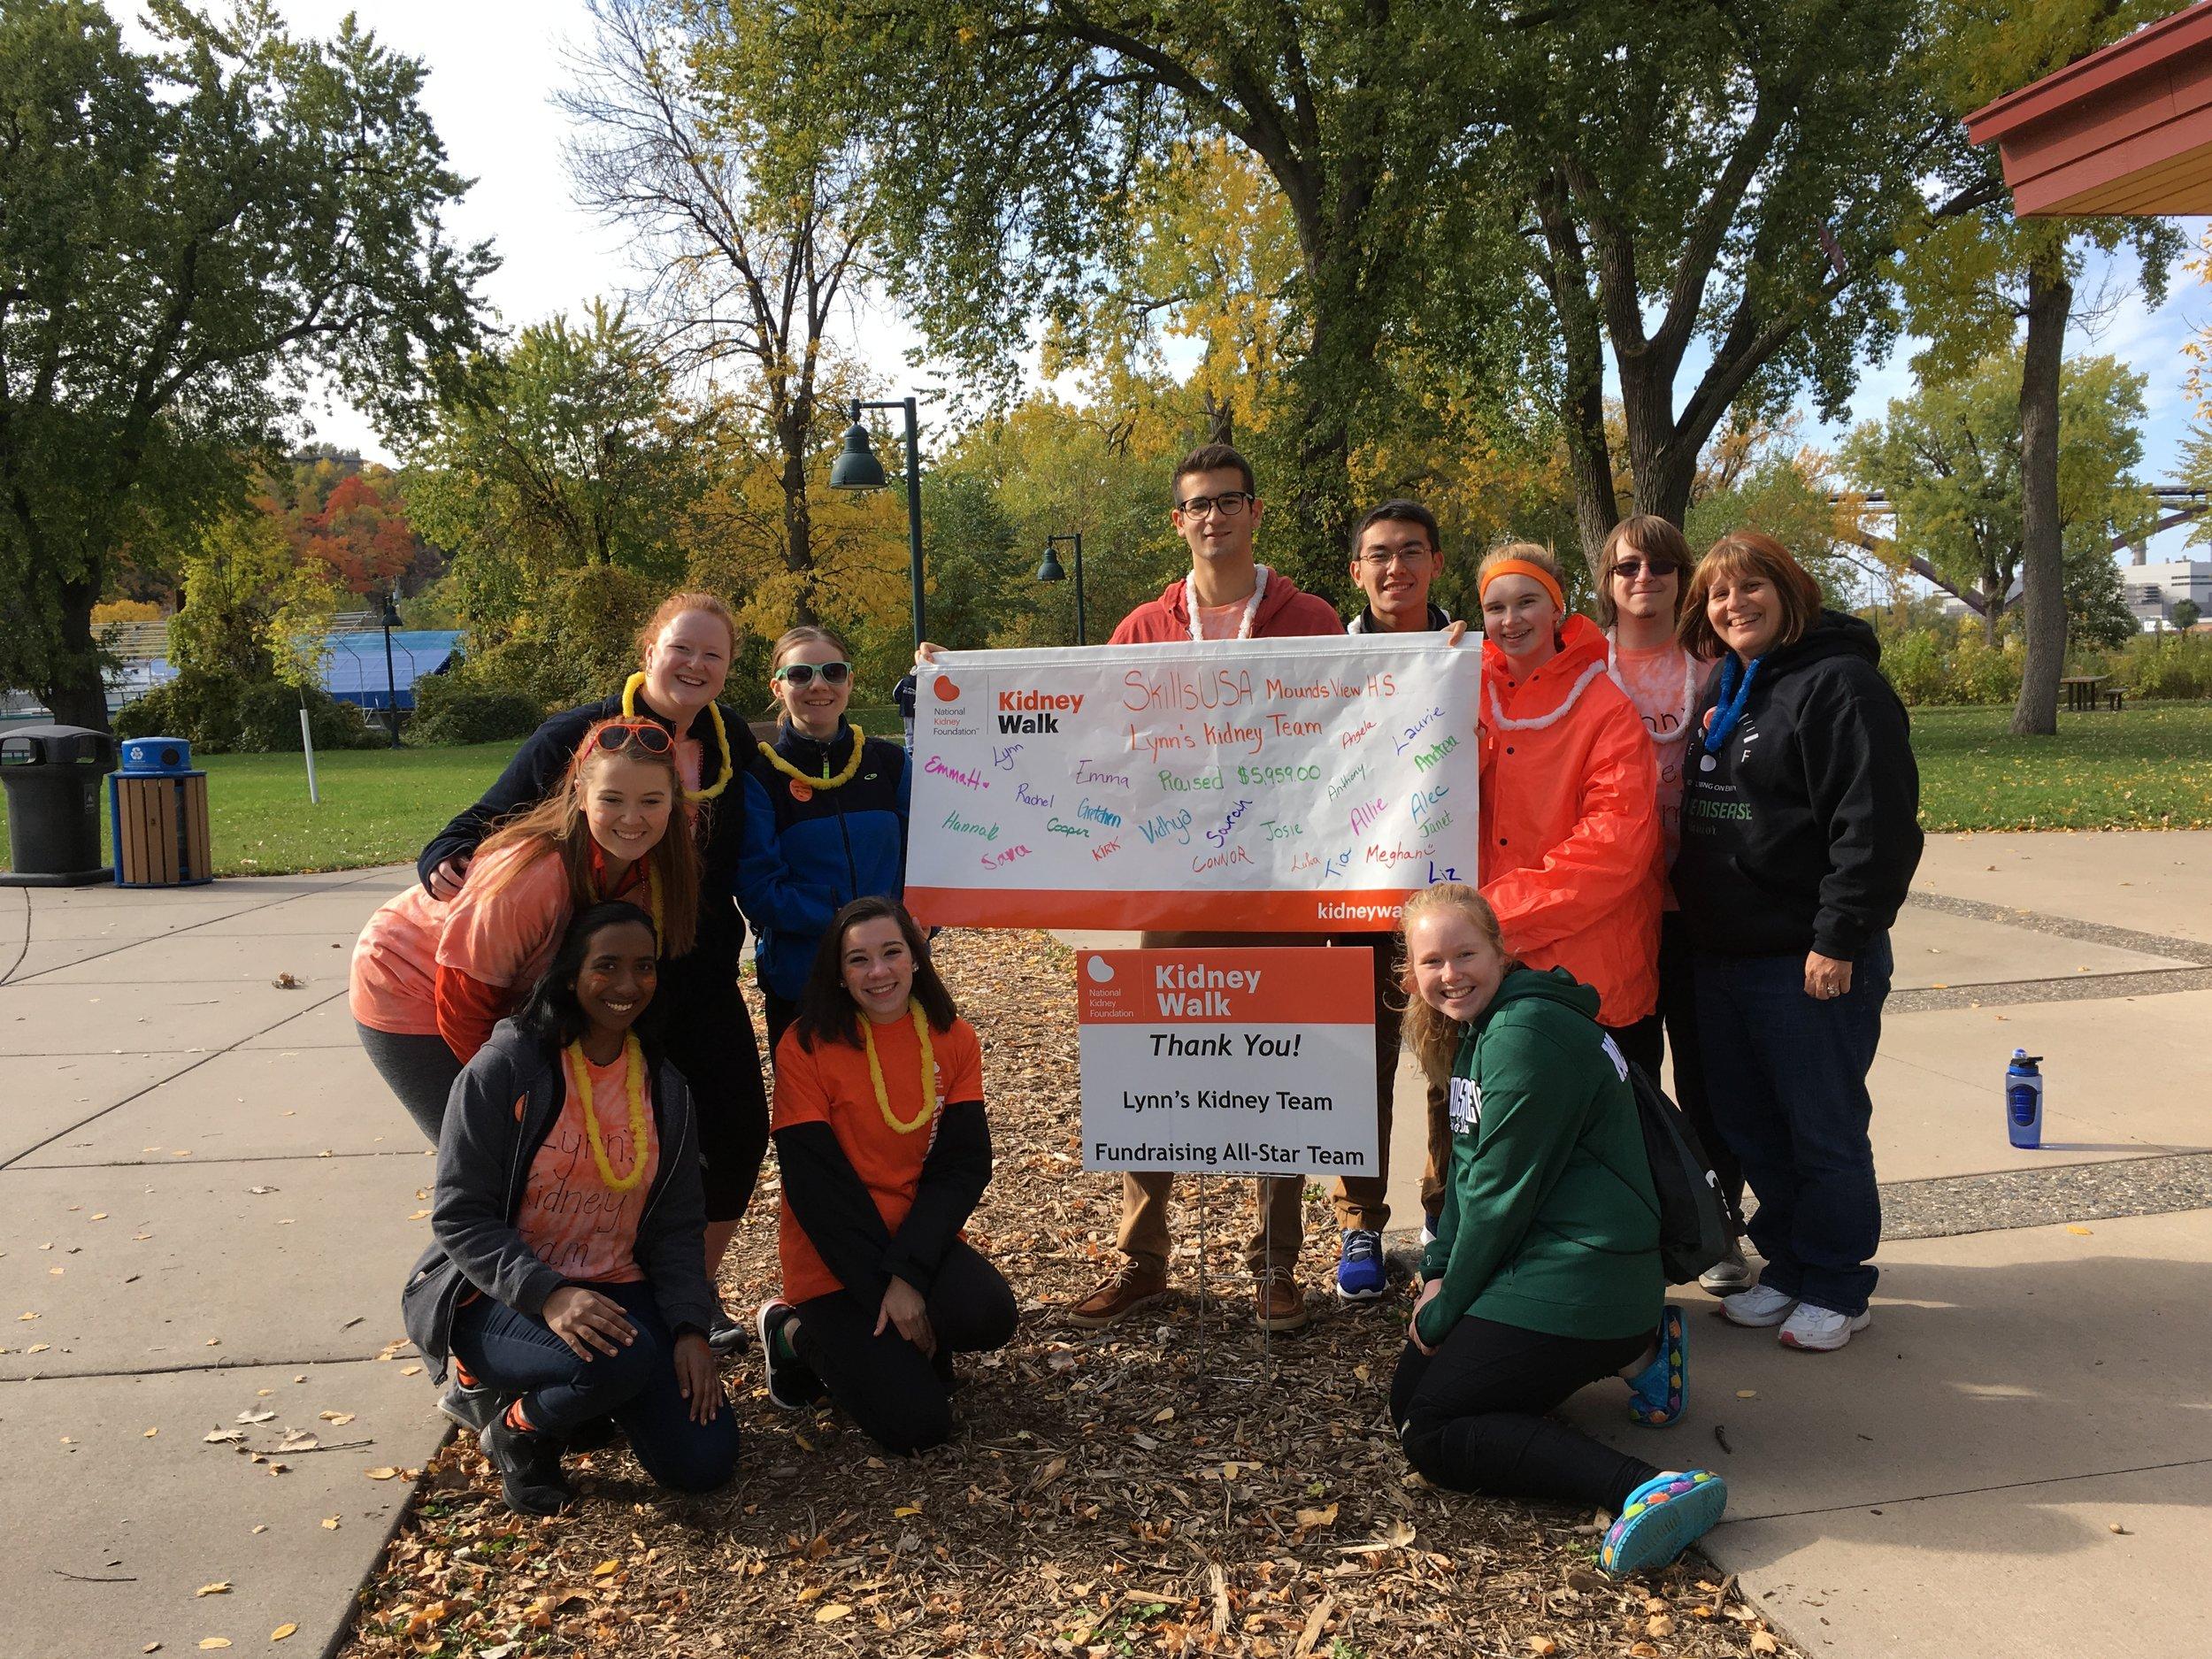 Lynn Nelson's School Team; Fundraising Kidney Walk